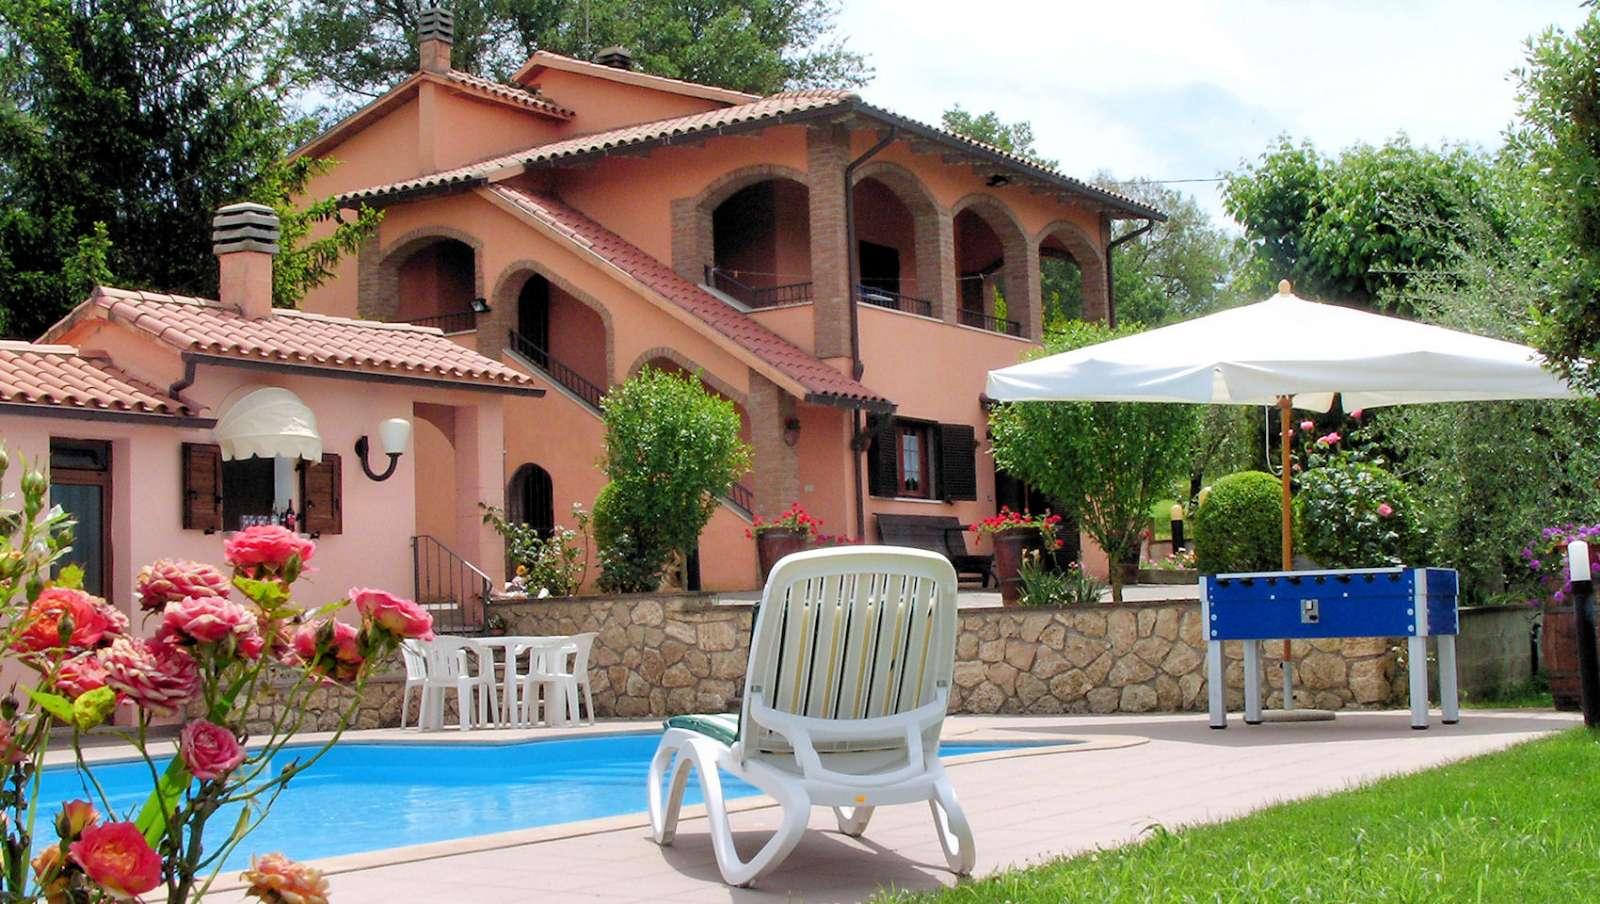 Villa Santa Teresa in Baschi